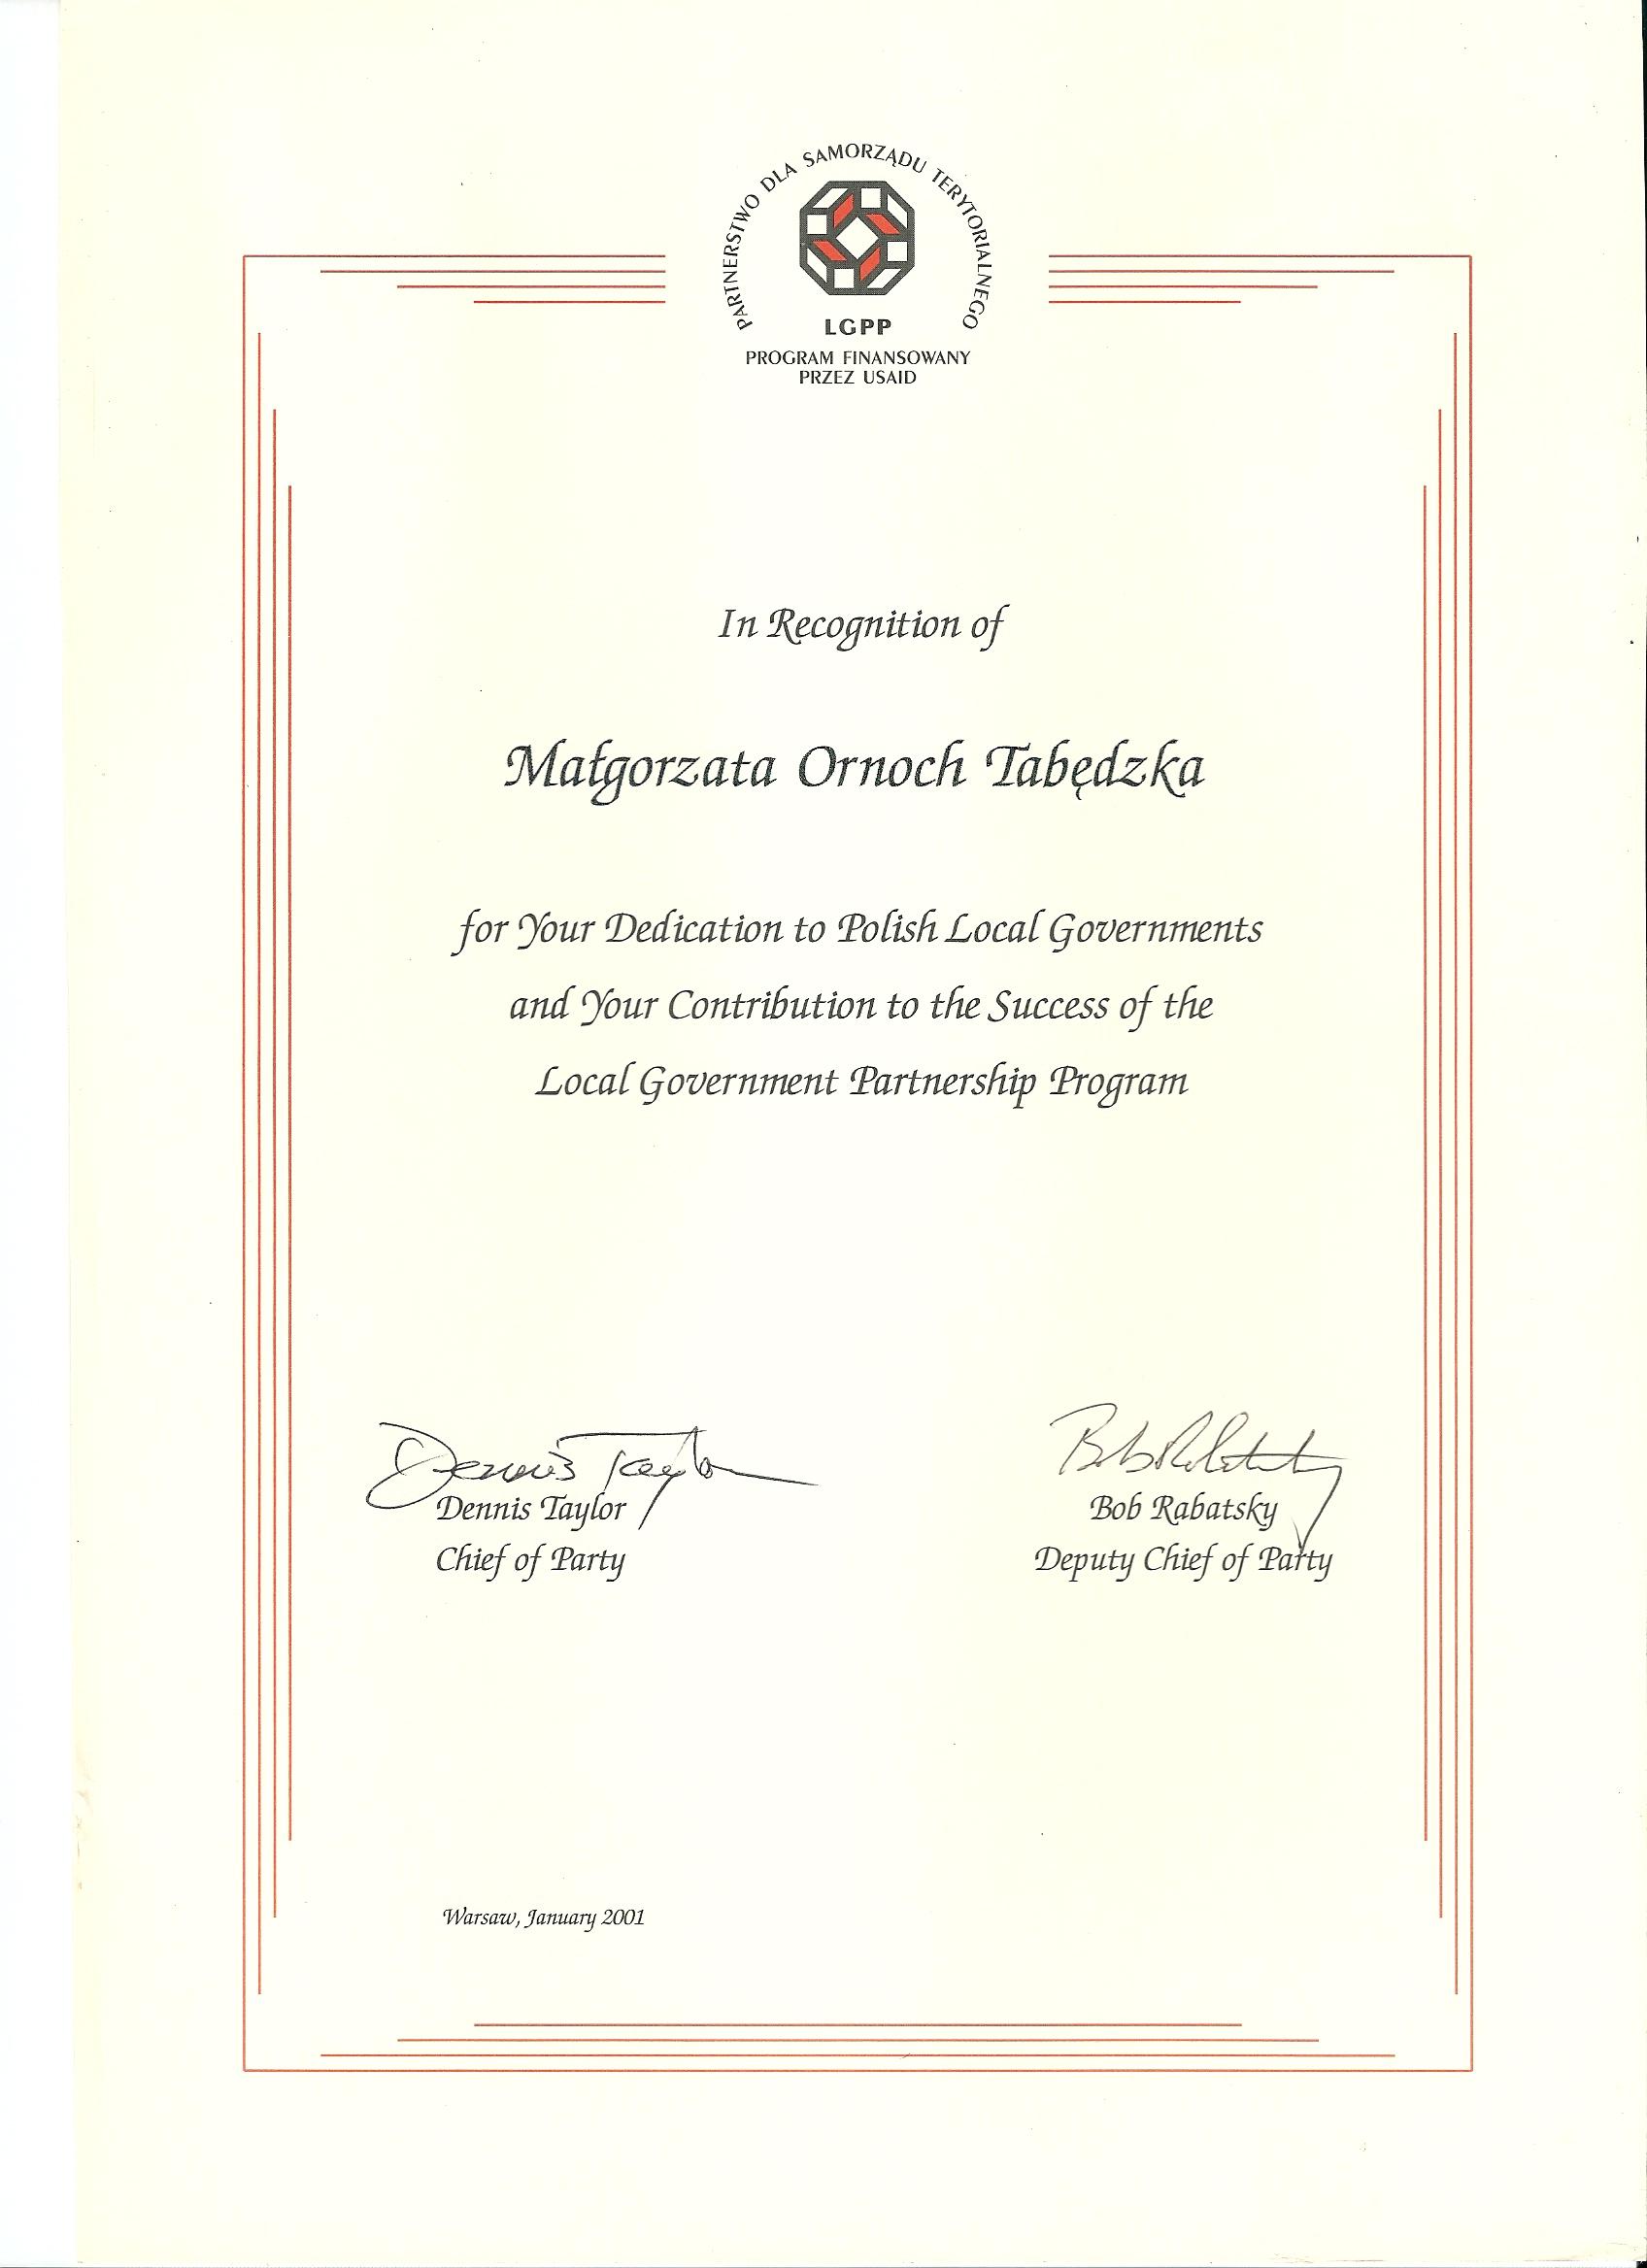 LGPP_Certificate